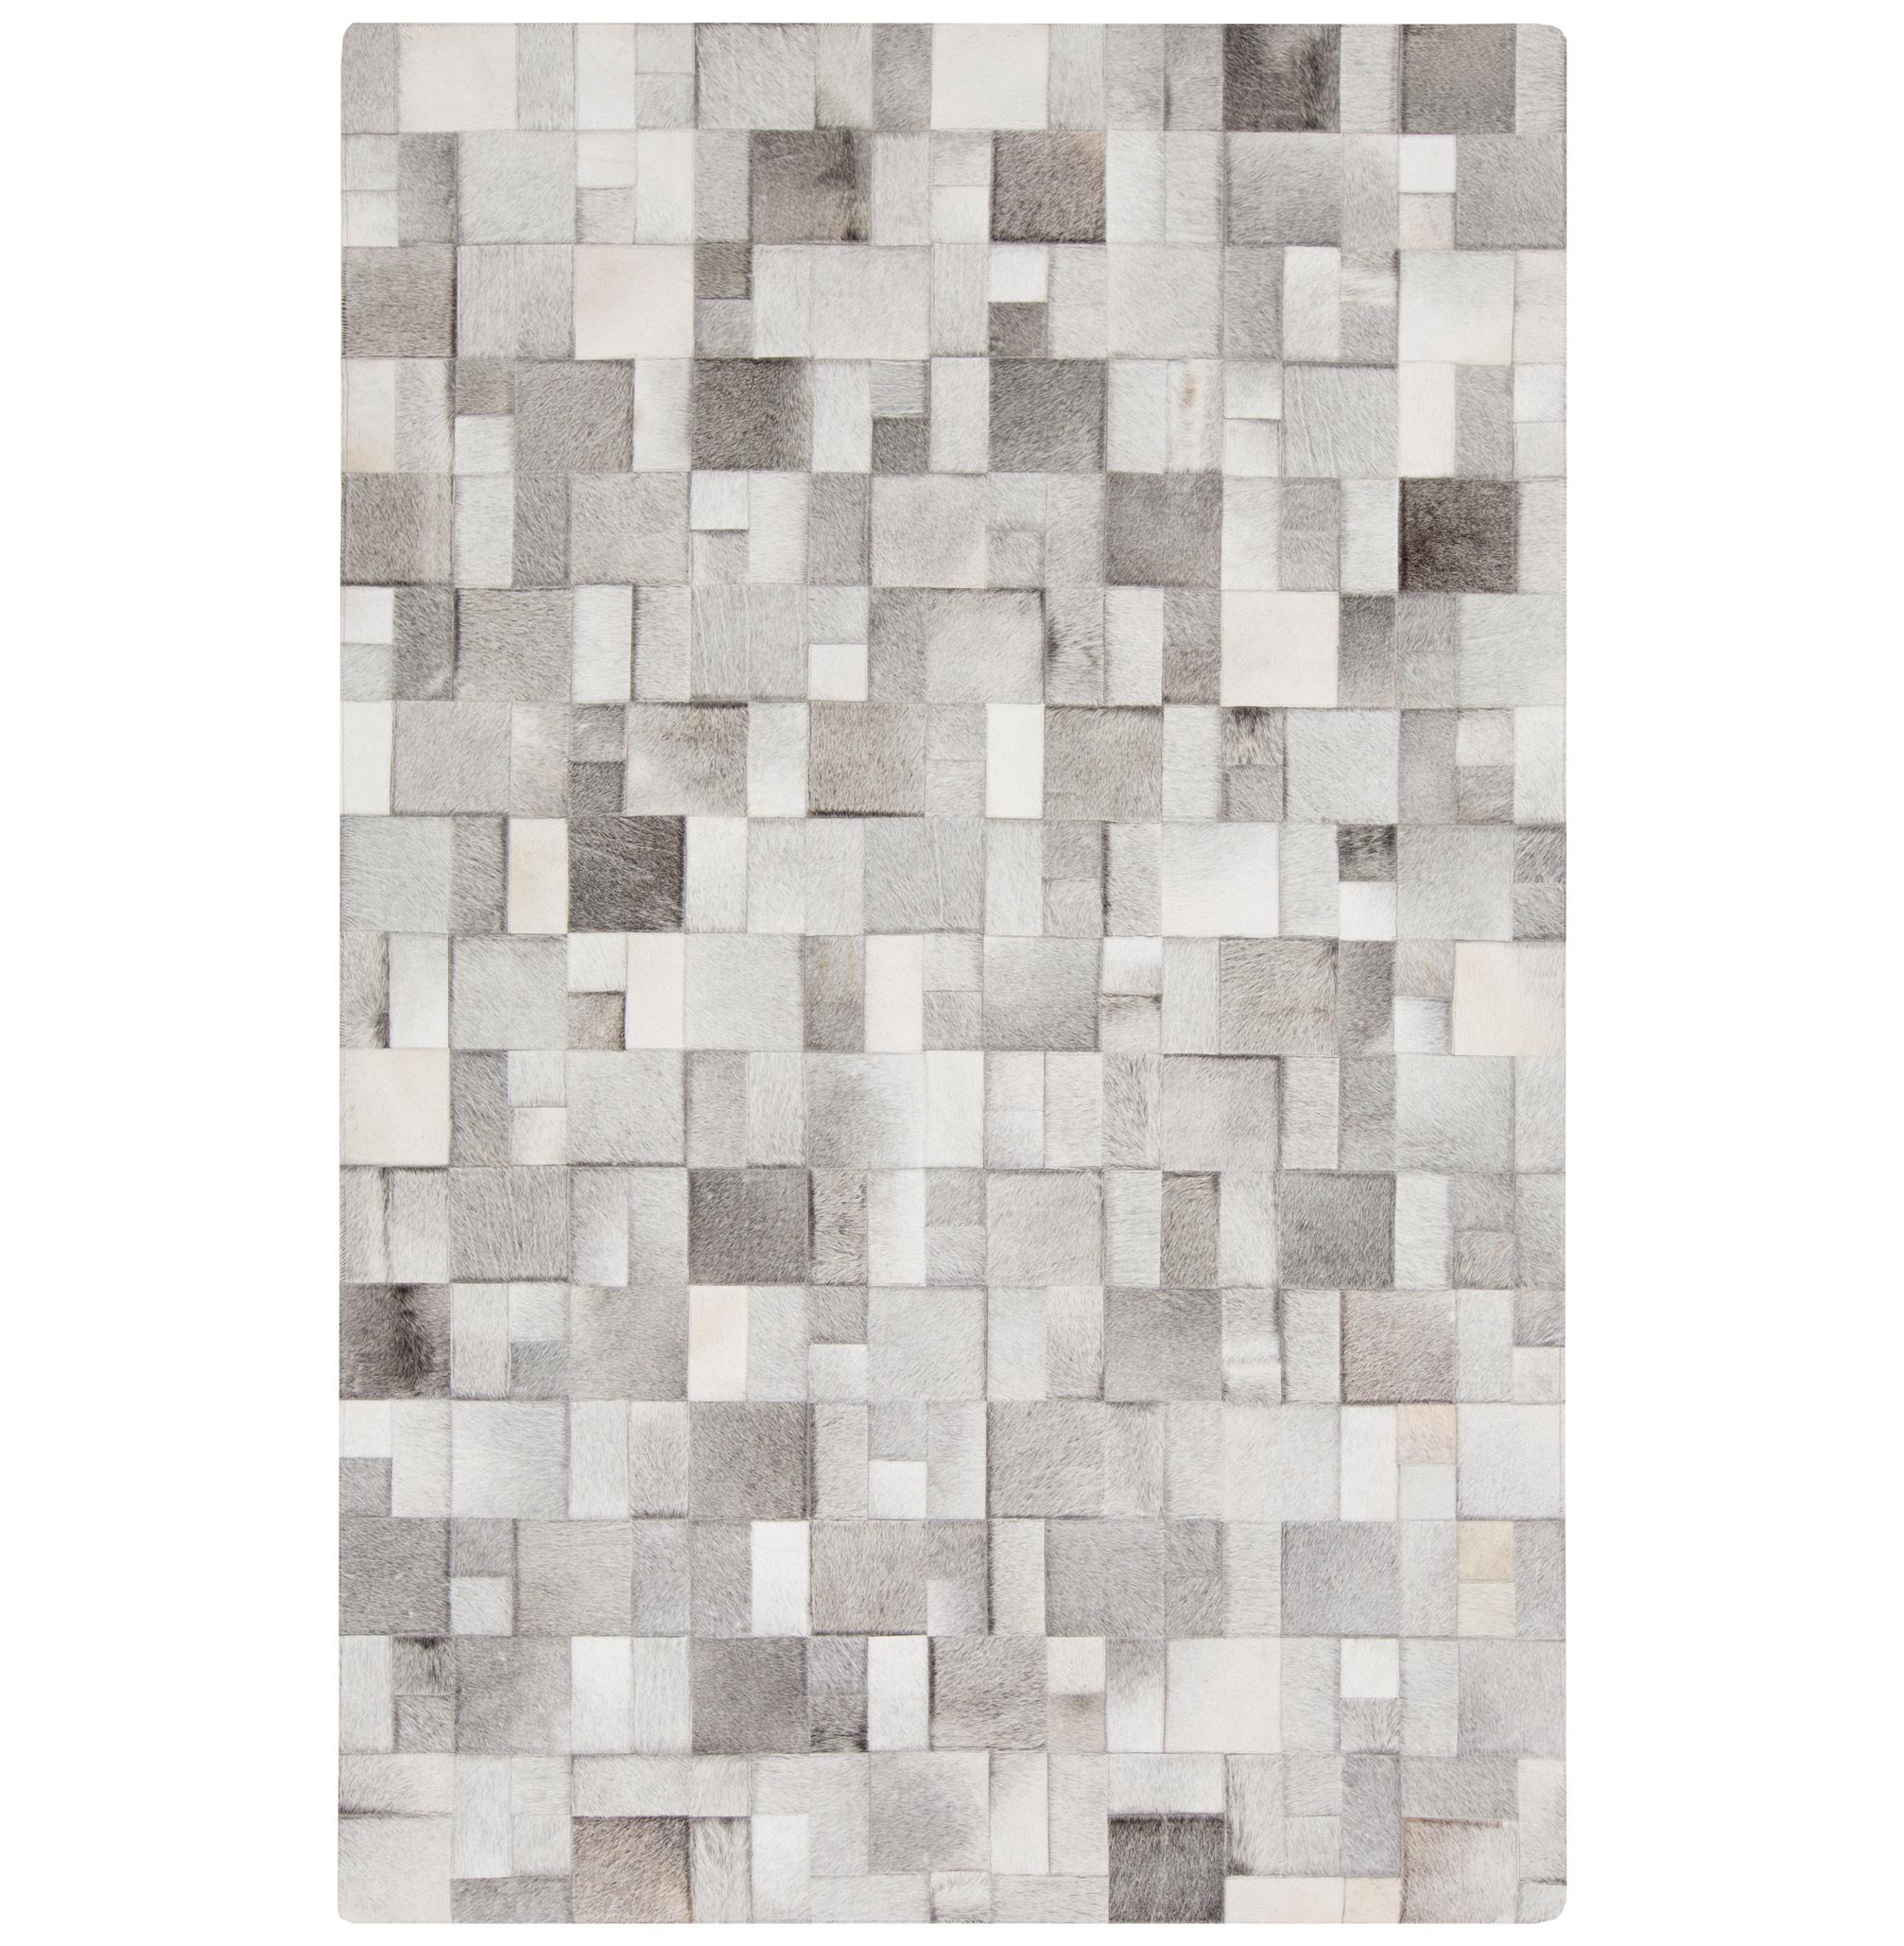 Bursa Global Bazaar Mondrian Tile Grey White Cowhide Rug - 8x10